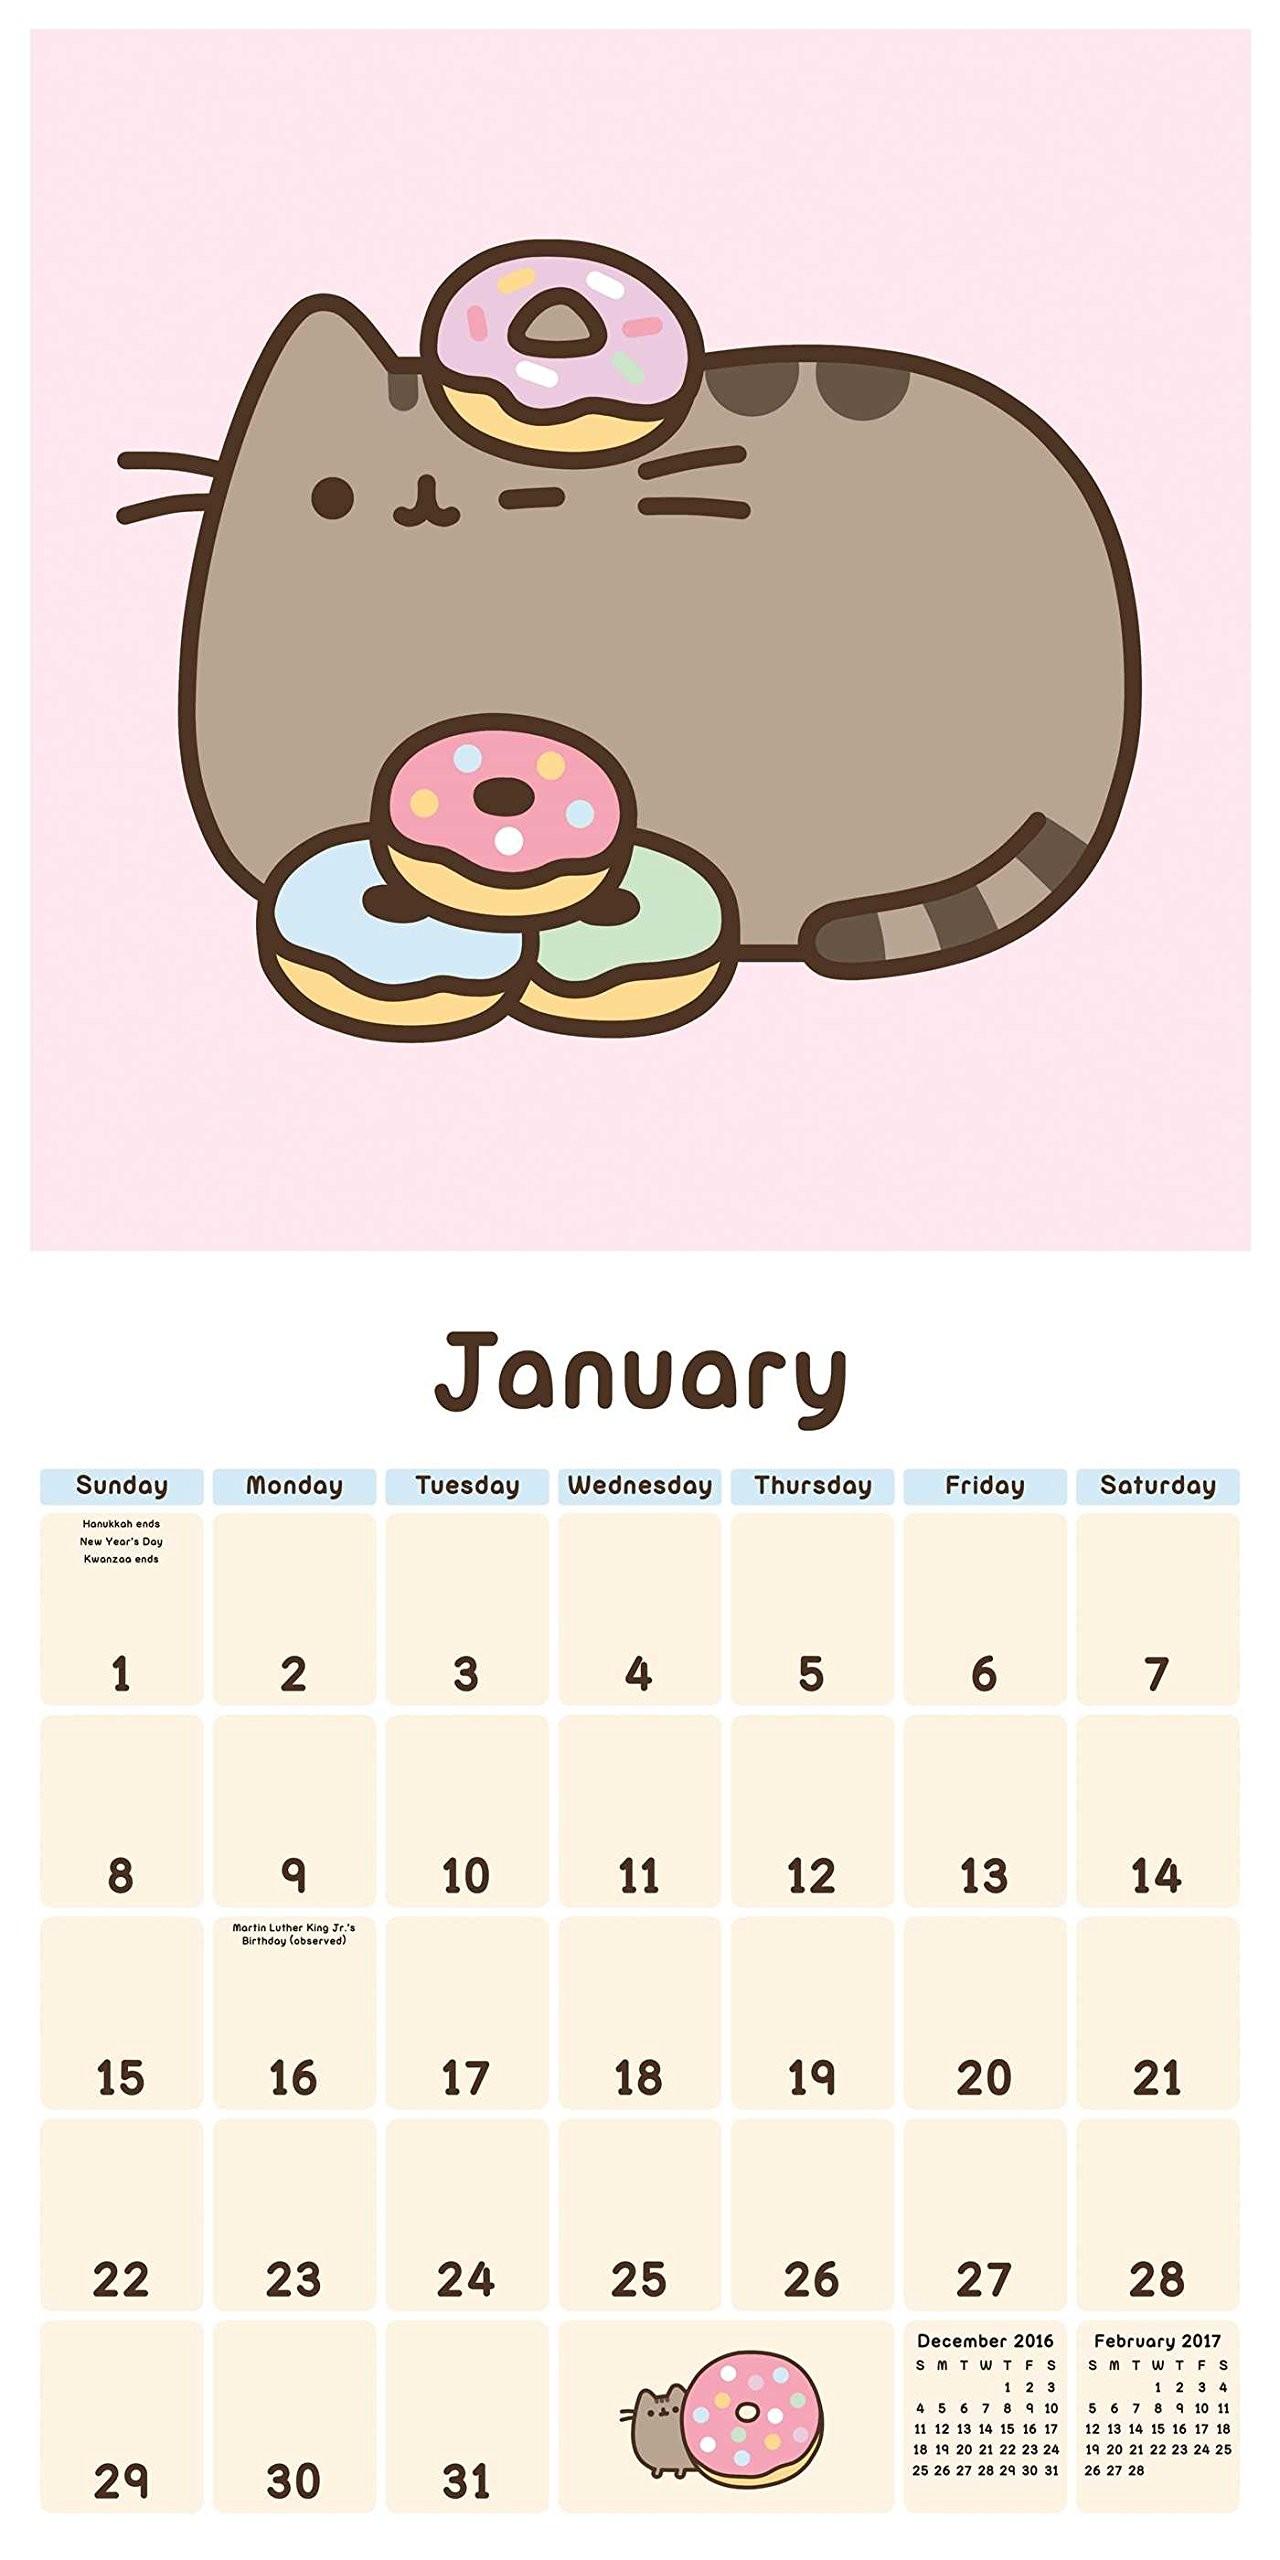 Pusheen the Cat 2017 Wall Calendar: Claire Belton: 0050837355569:  Amazon.com: Books